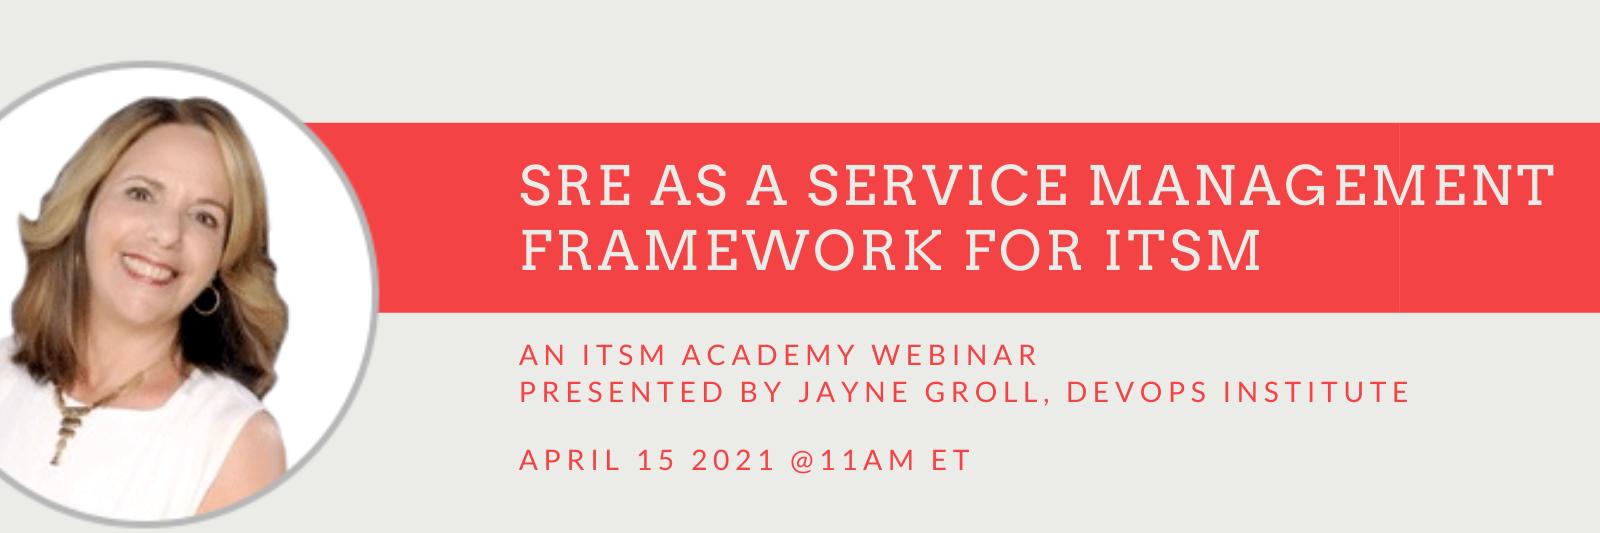 SRE as a Service Management Framework